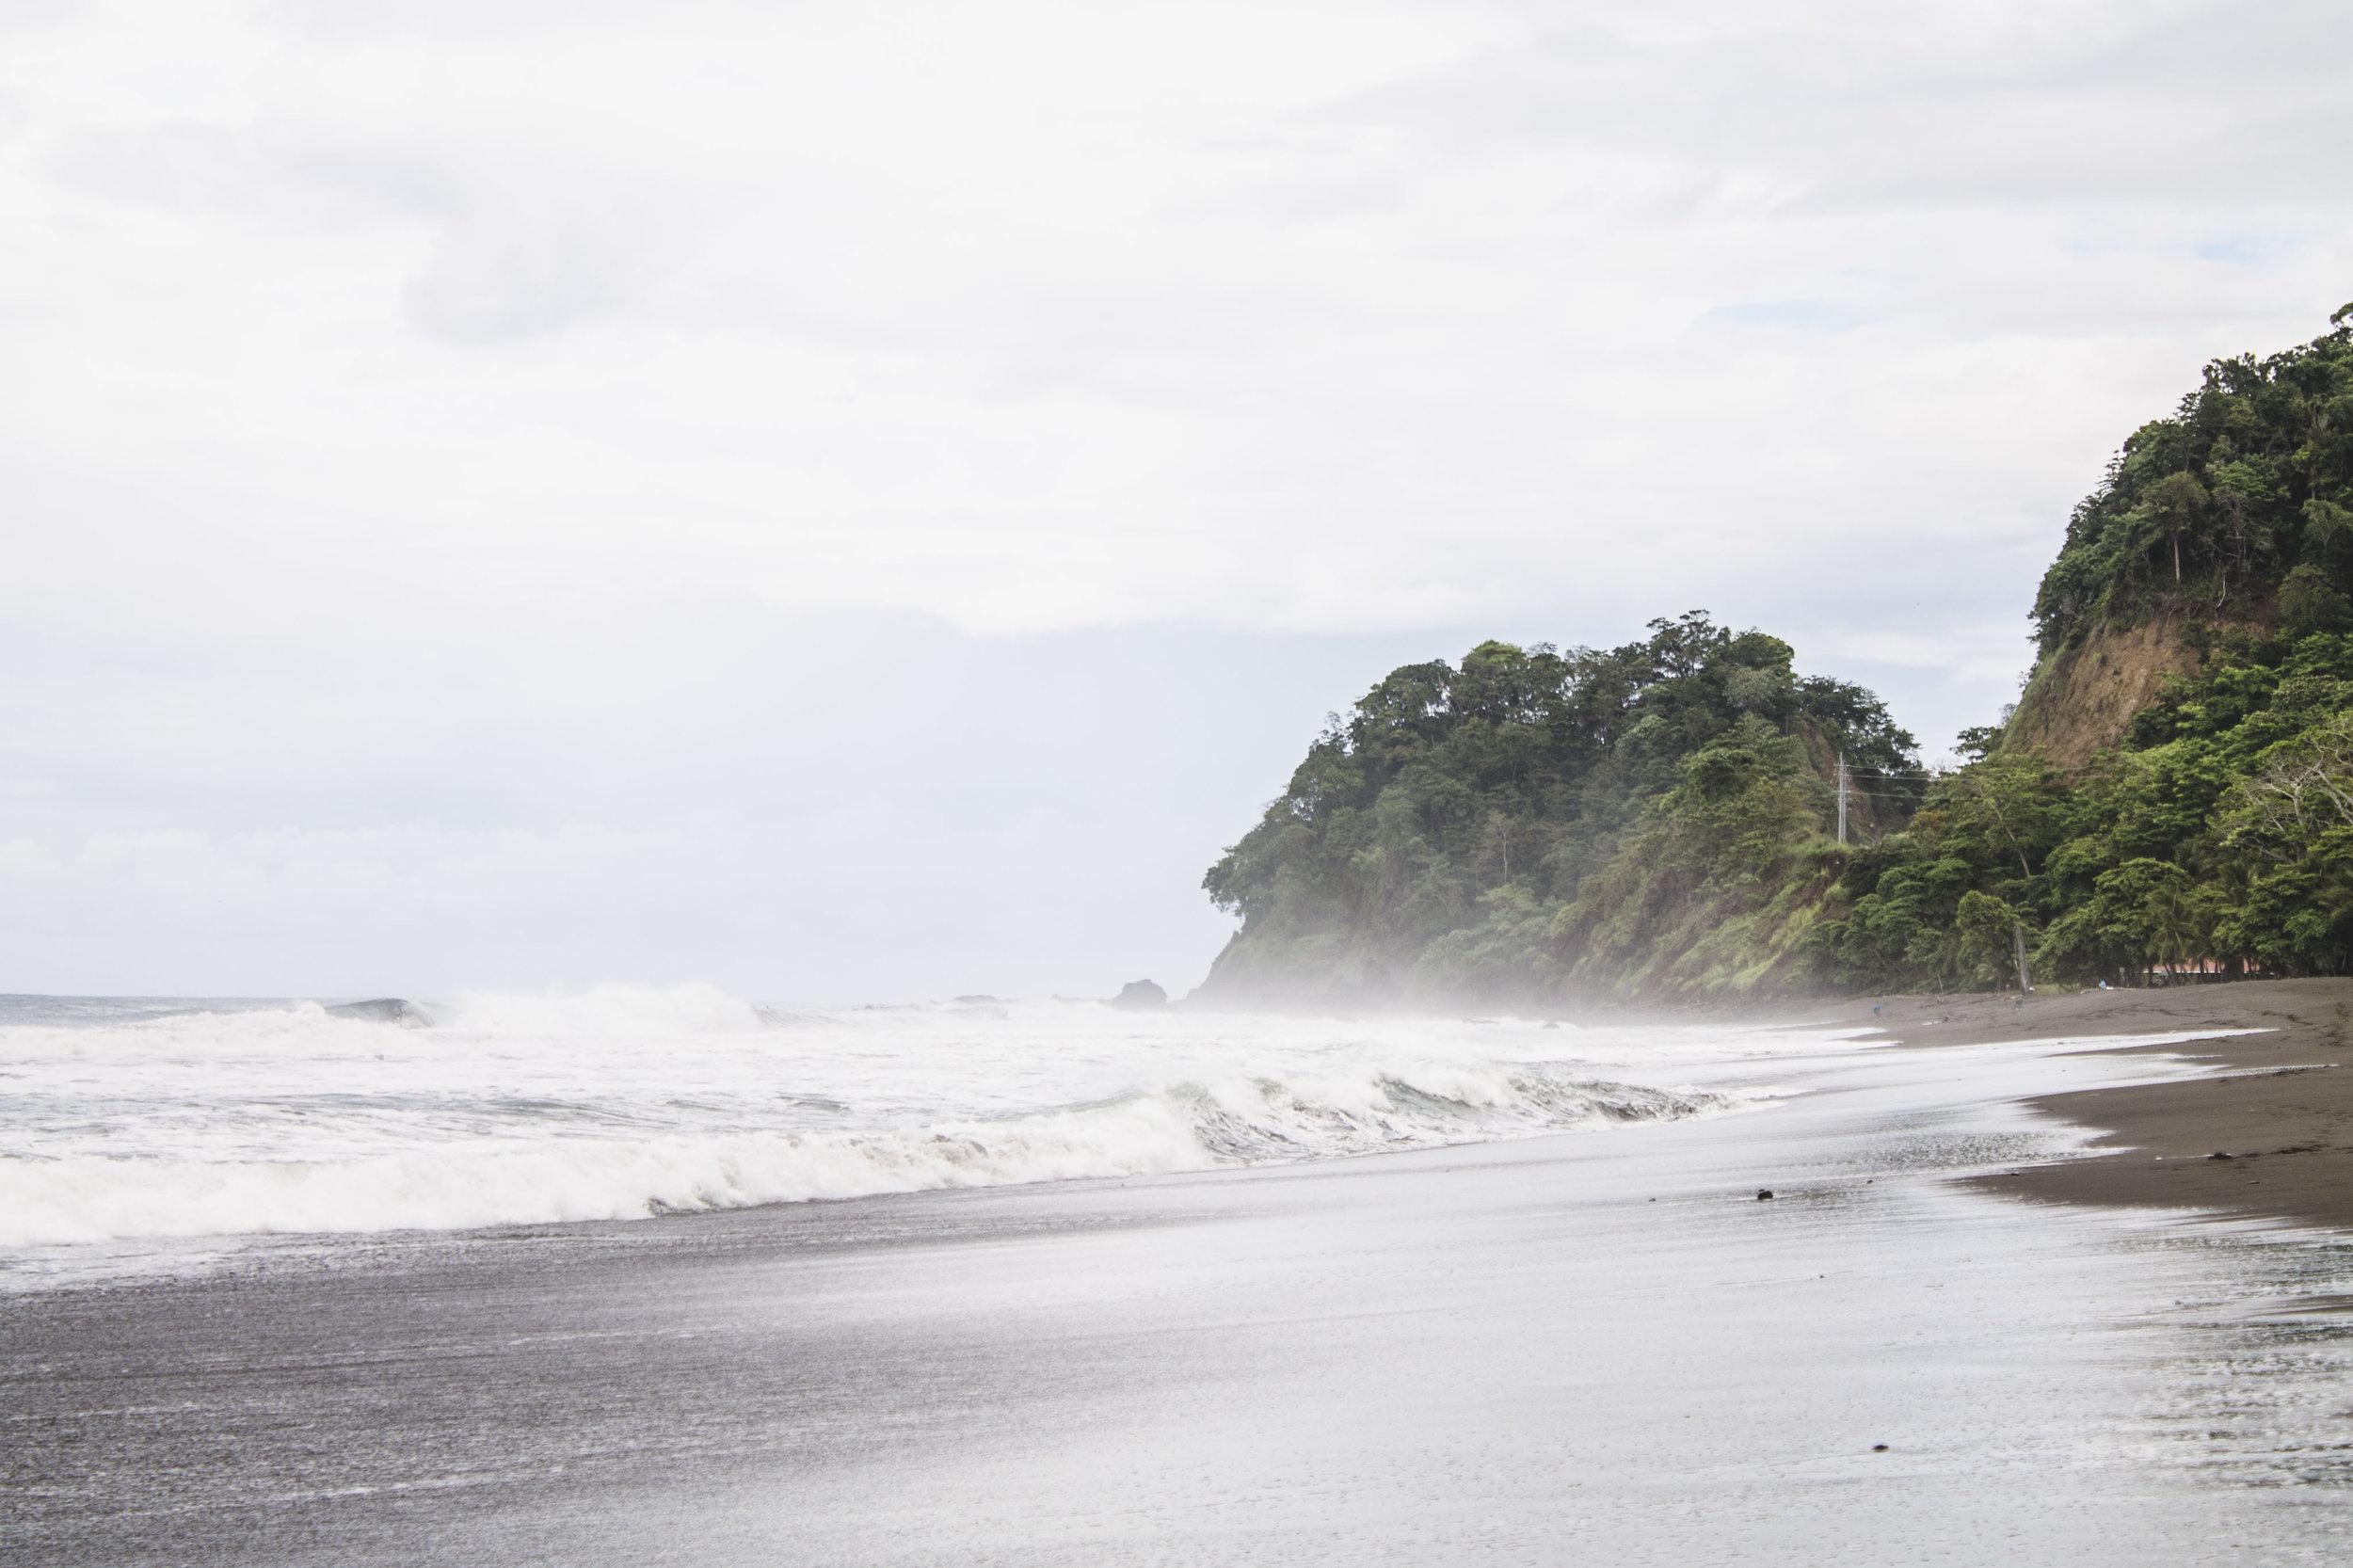 Playa Hermosa in Jaco, Costa Rica during the rainy season